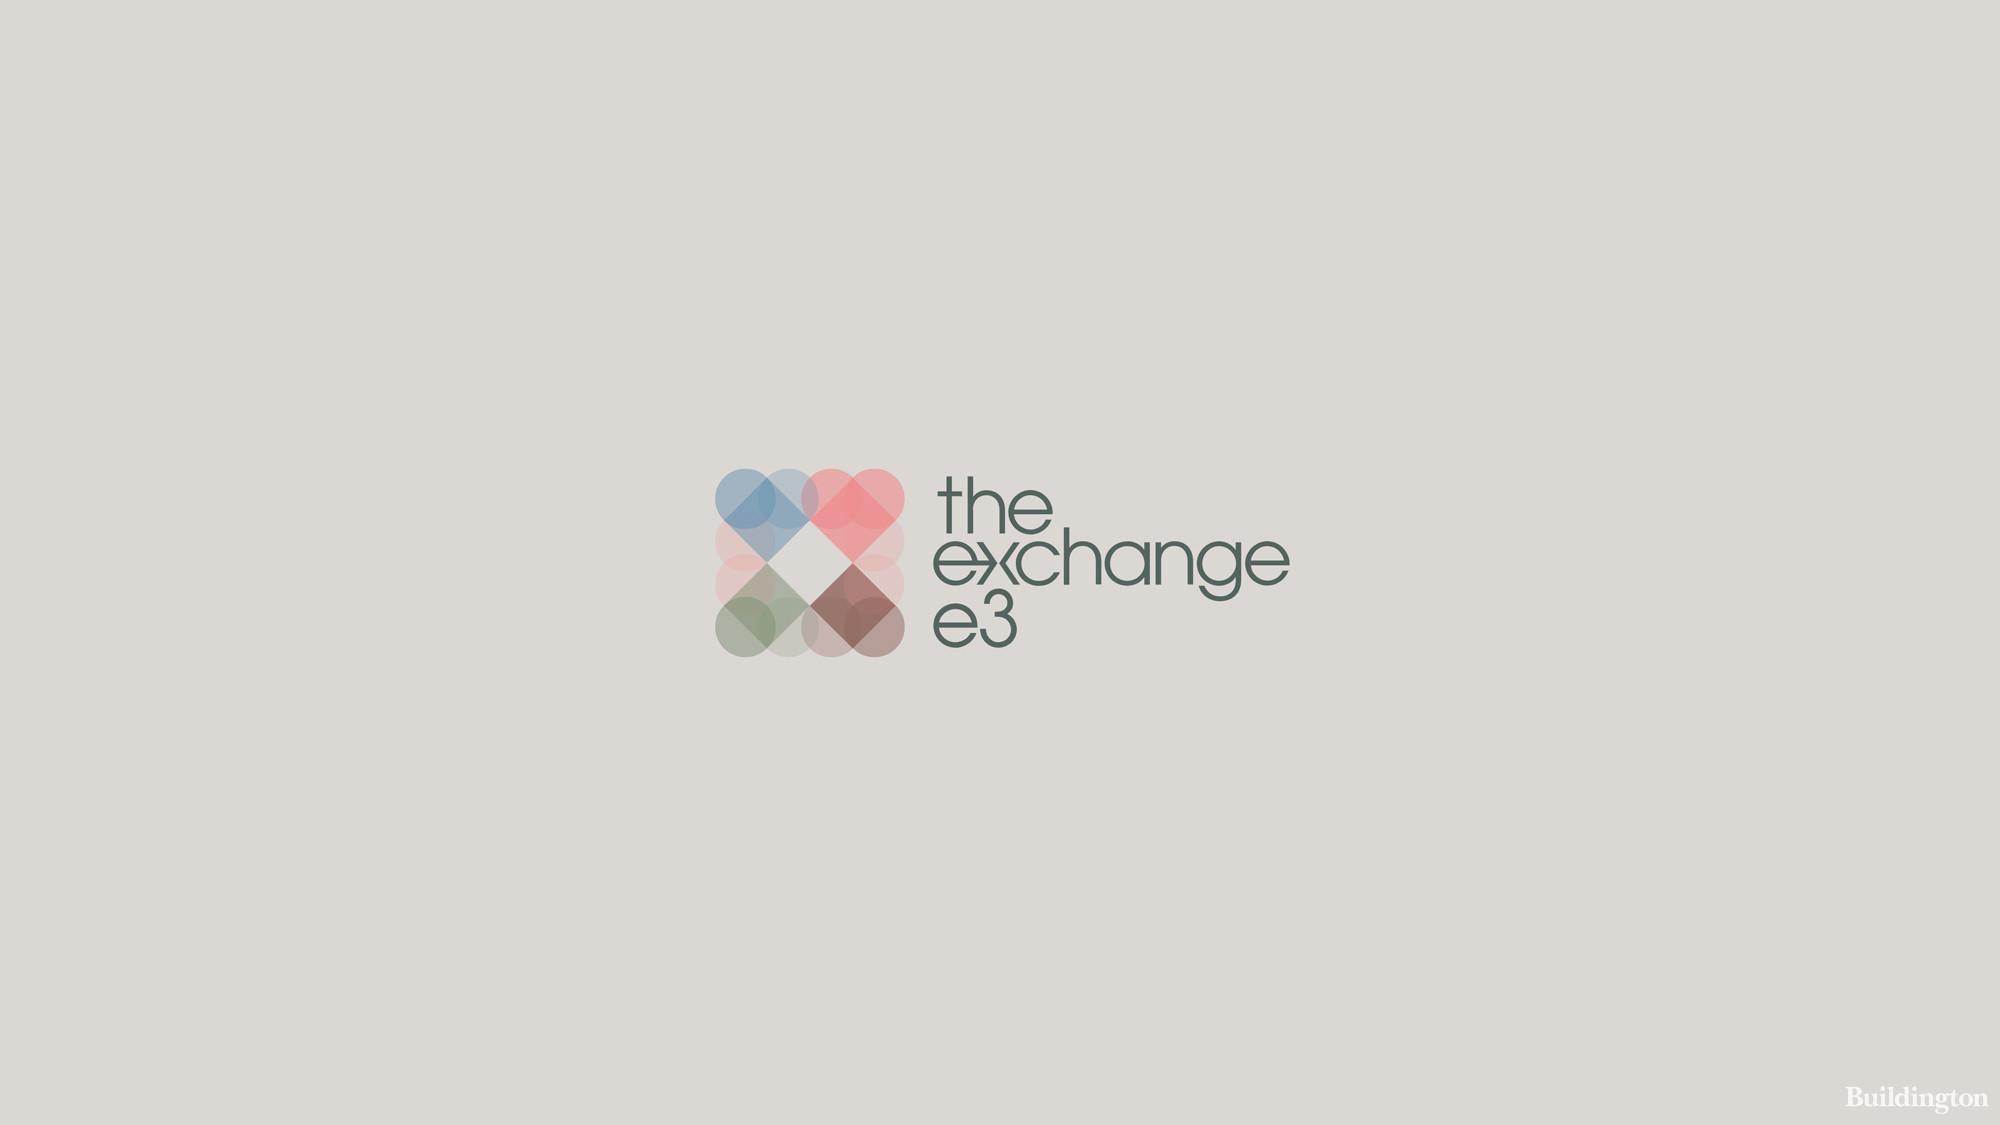 Logo of The Exchange development in Limehouse Cut London E3.